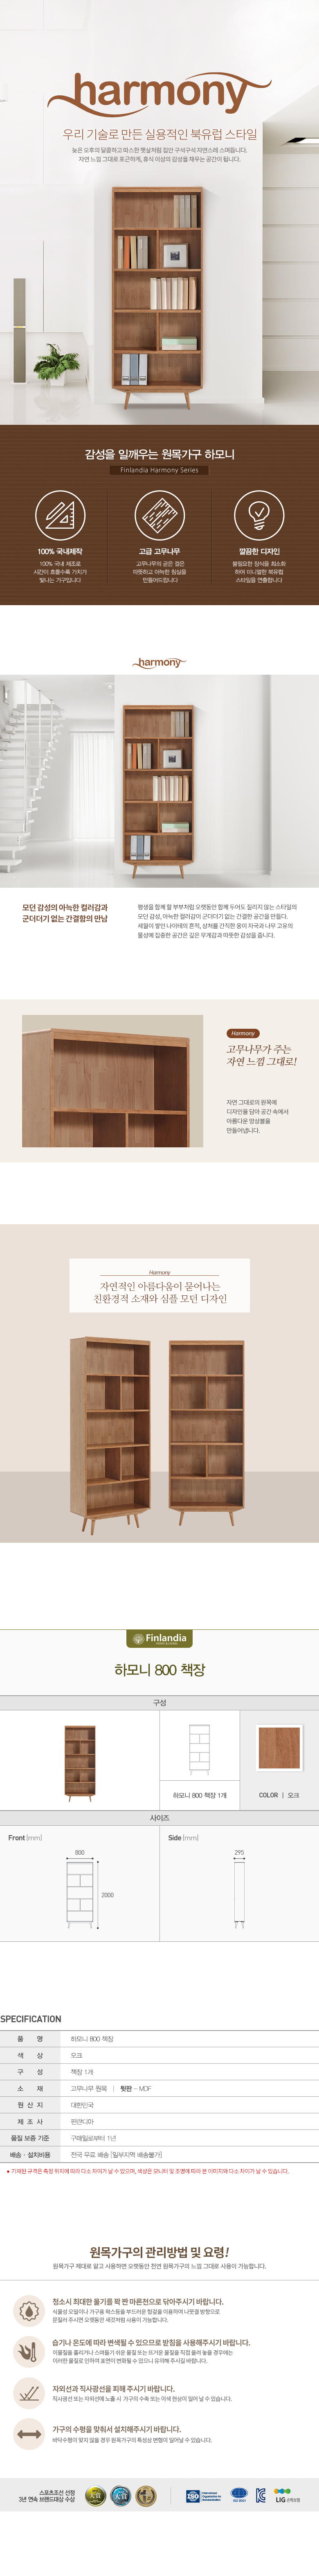 800bookcase.jpg